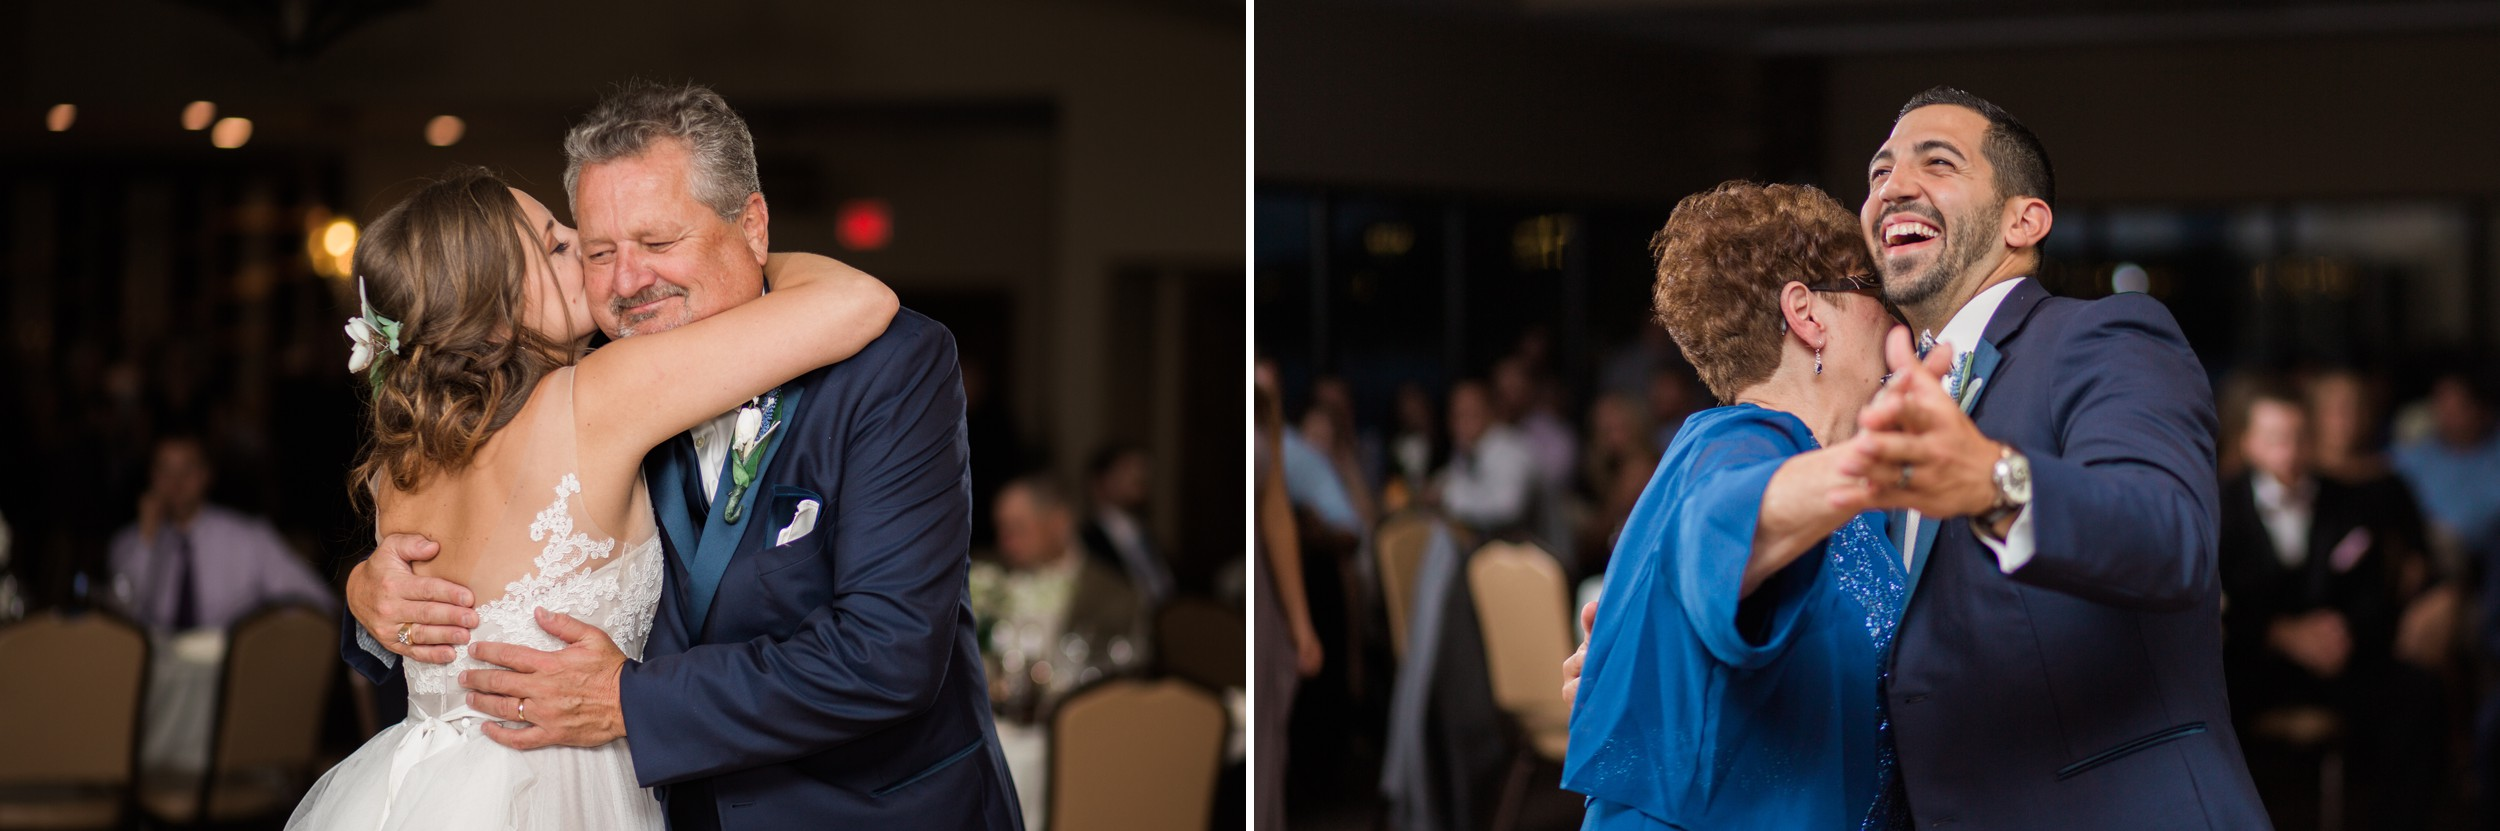 nick- and-martina-pine-lake-vinyards-tracylynn-photography-columbiana-ohio-wedding 5.jpg